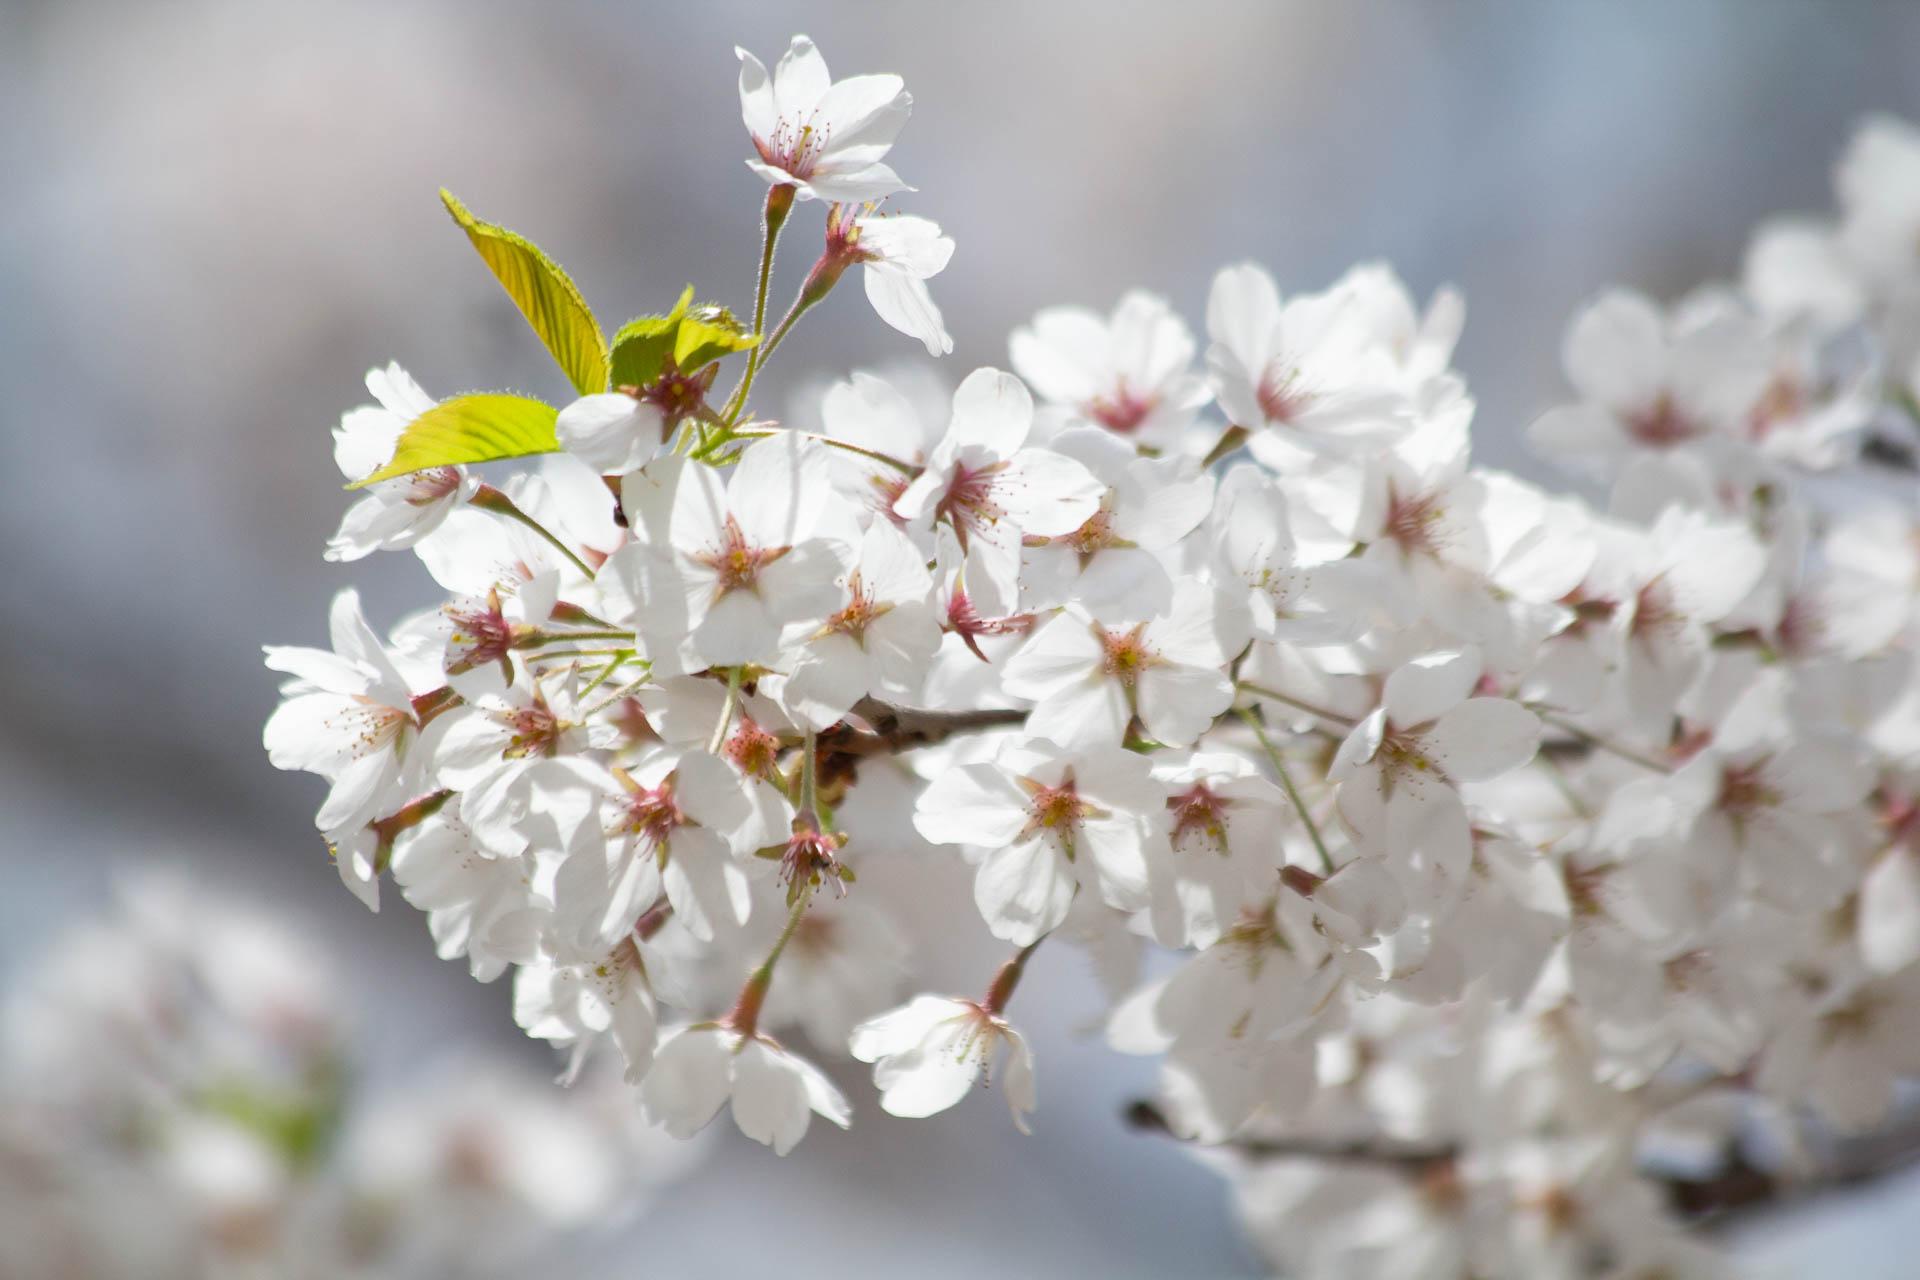 Sakura-Watch-May-10-2018-123.jpg